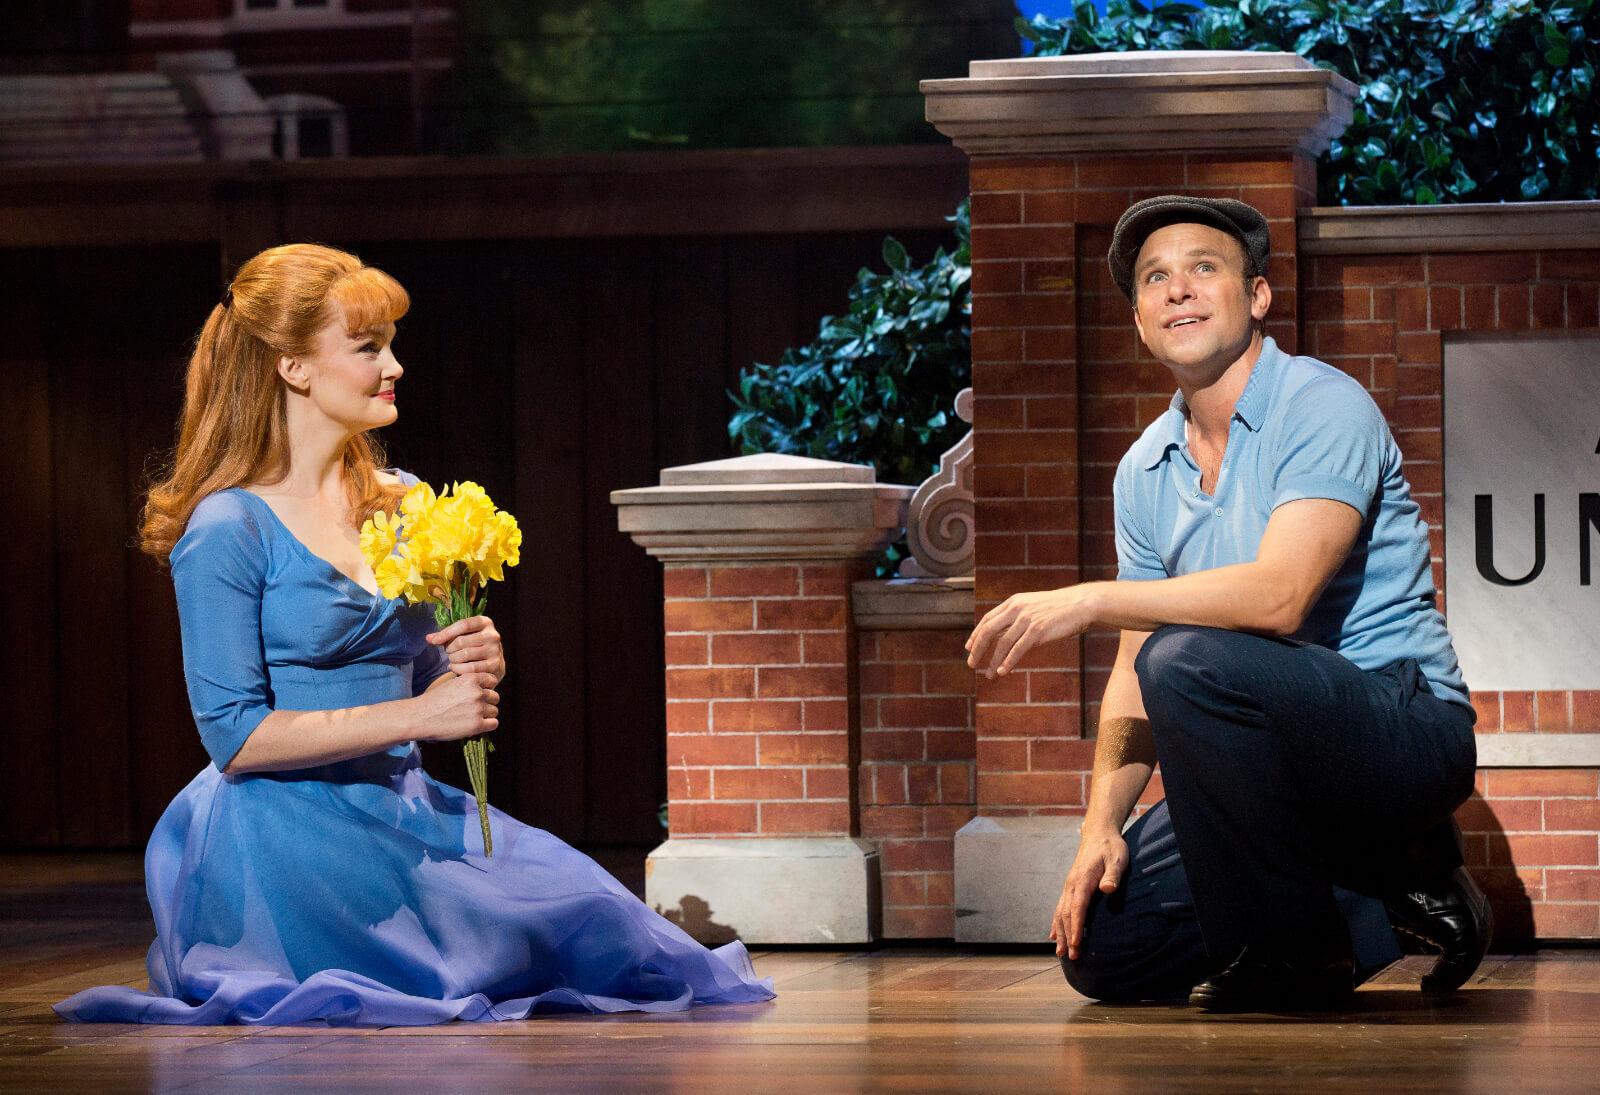 Sandra (Kate Baldwin) holds flowers as she and Edward Bloom (Norbert Leo Butz) share a moment.